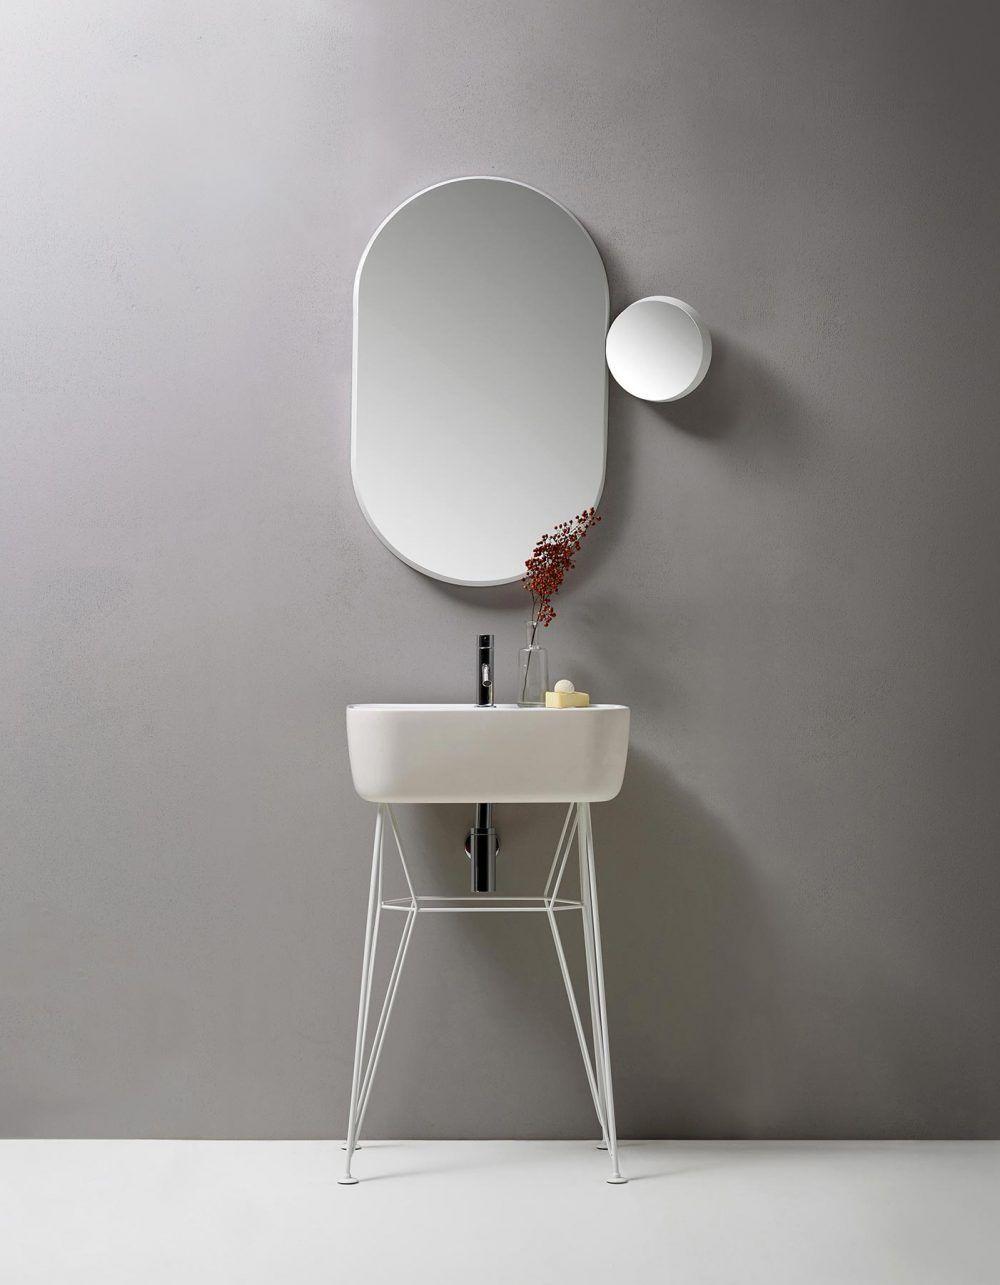 Forced Bathroom Remodel In: Float & Gravity